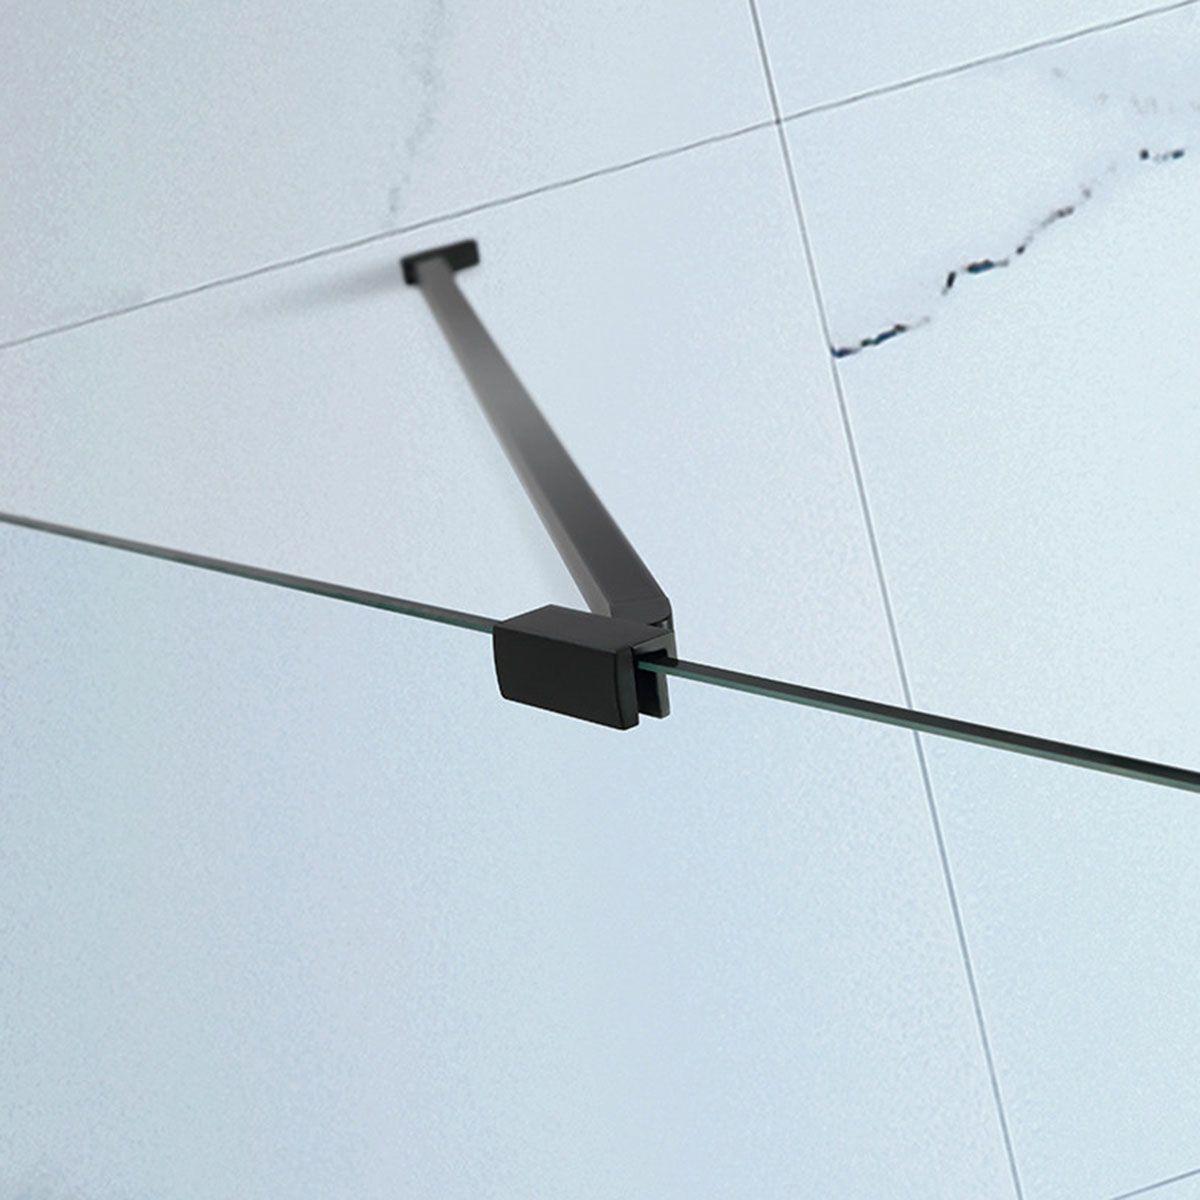 Frontline Aquaglass Onyx Black Hinged Shower Enclosure Support Arm